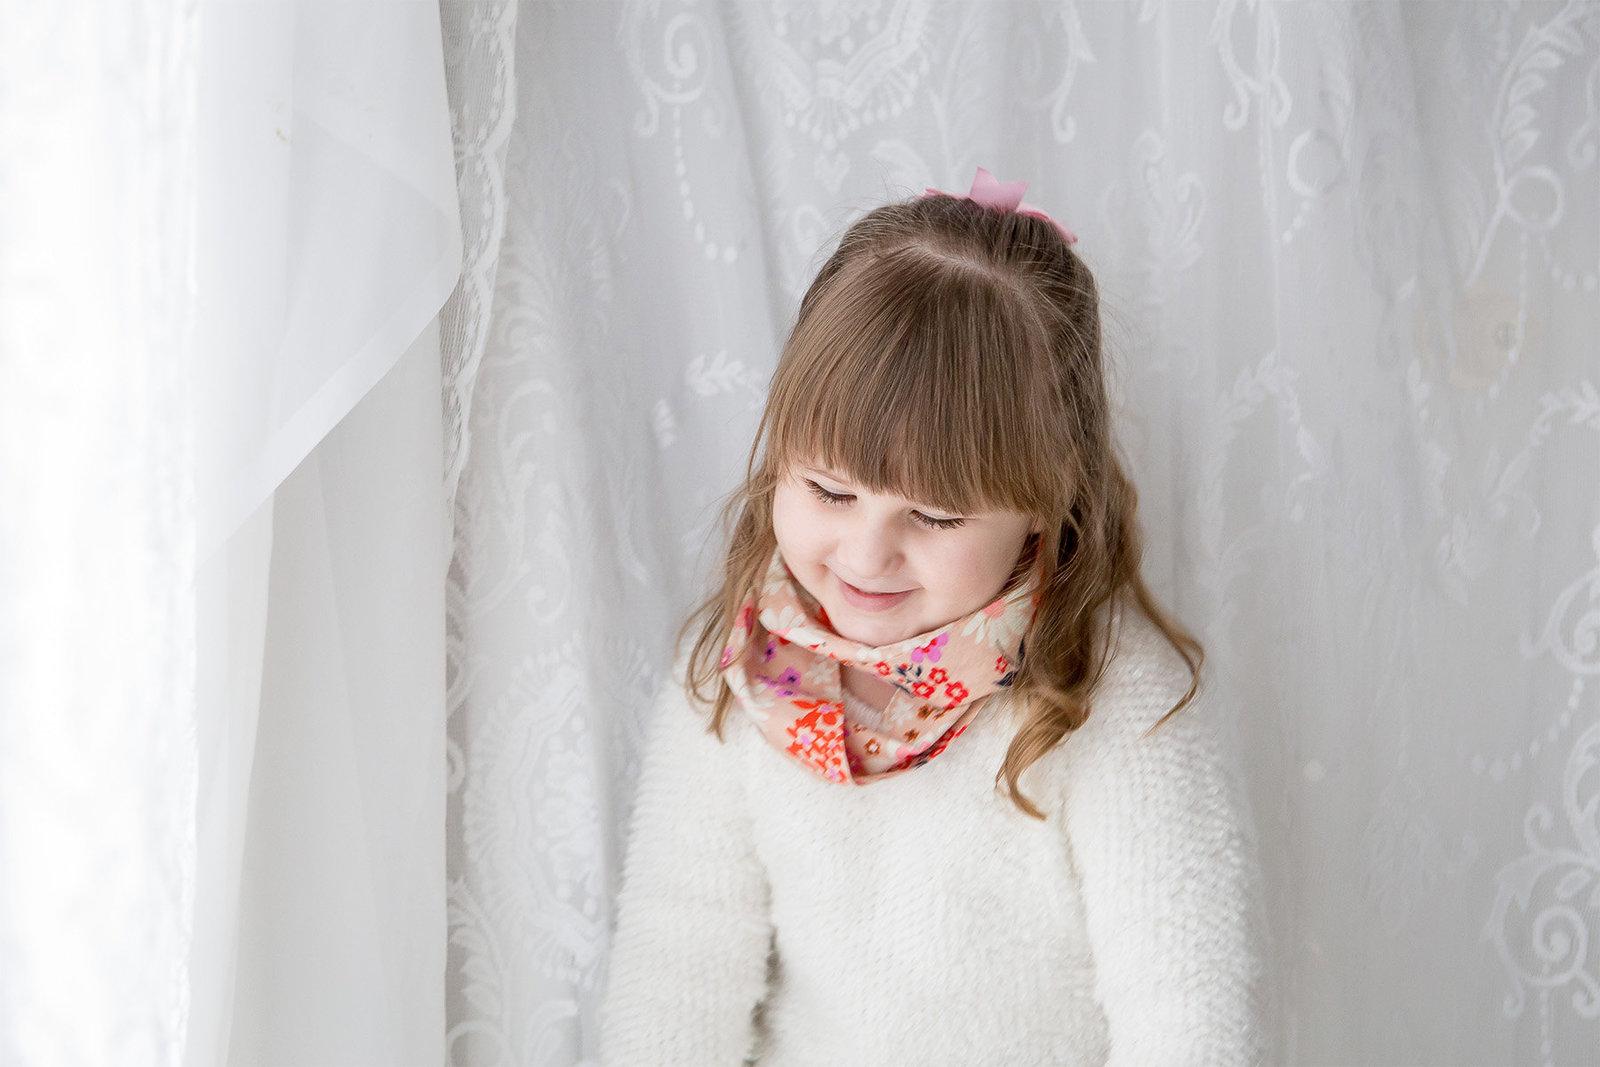 soft, pretty, casual, fun children's portraits Hudson Valley photographer Cornwall NY photo studio